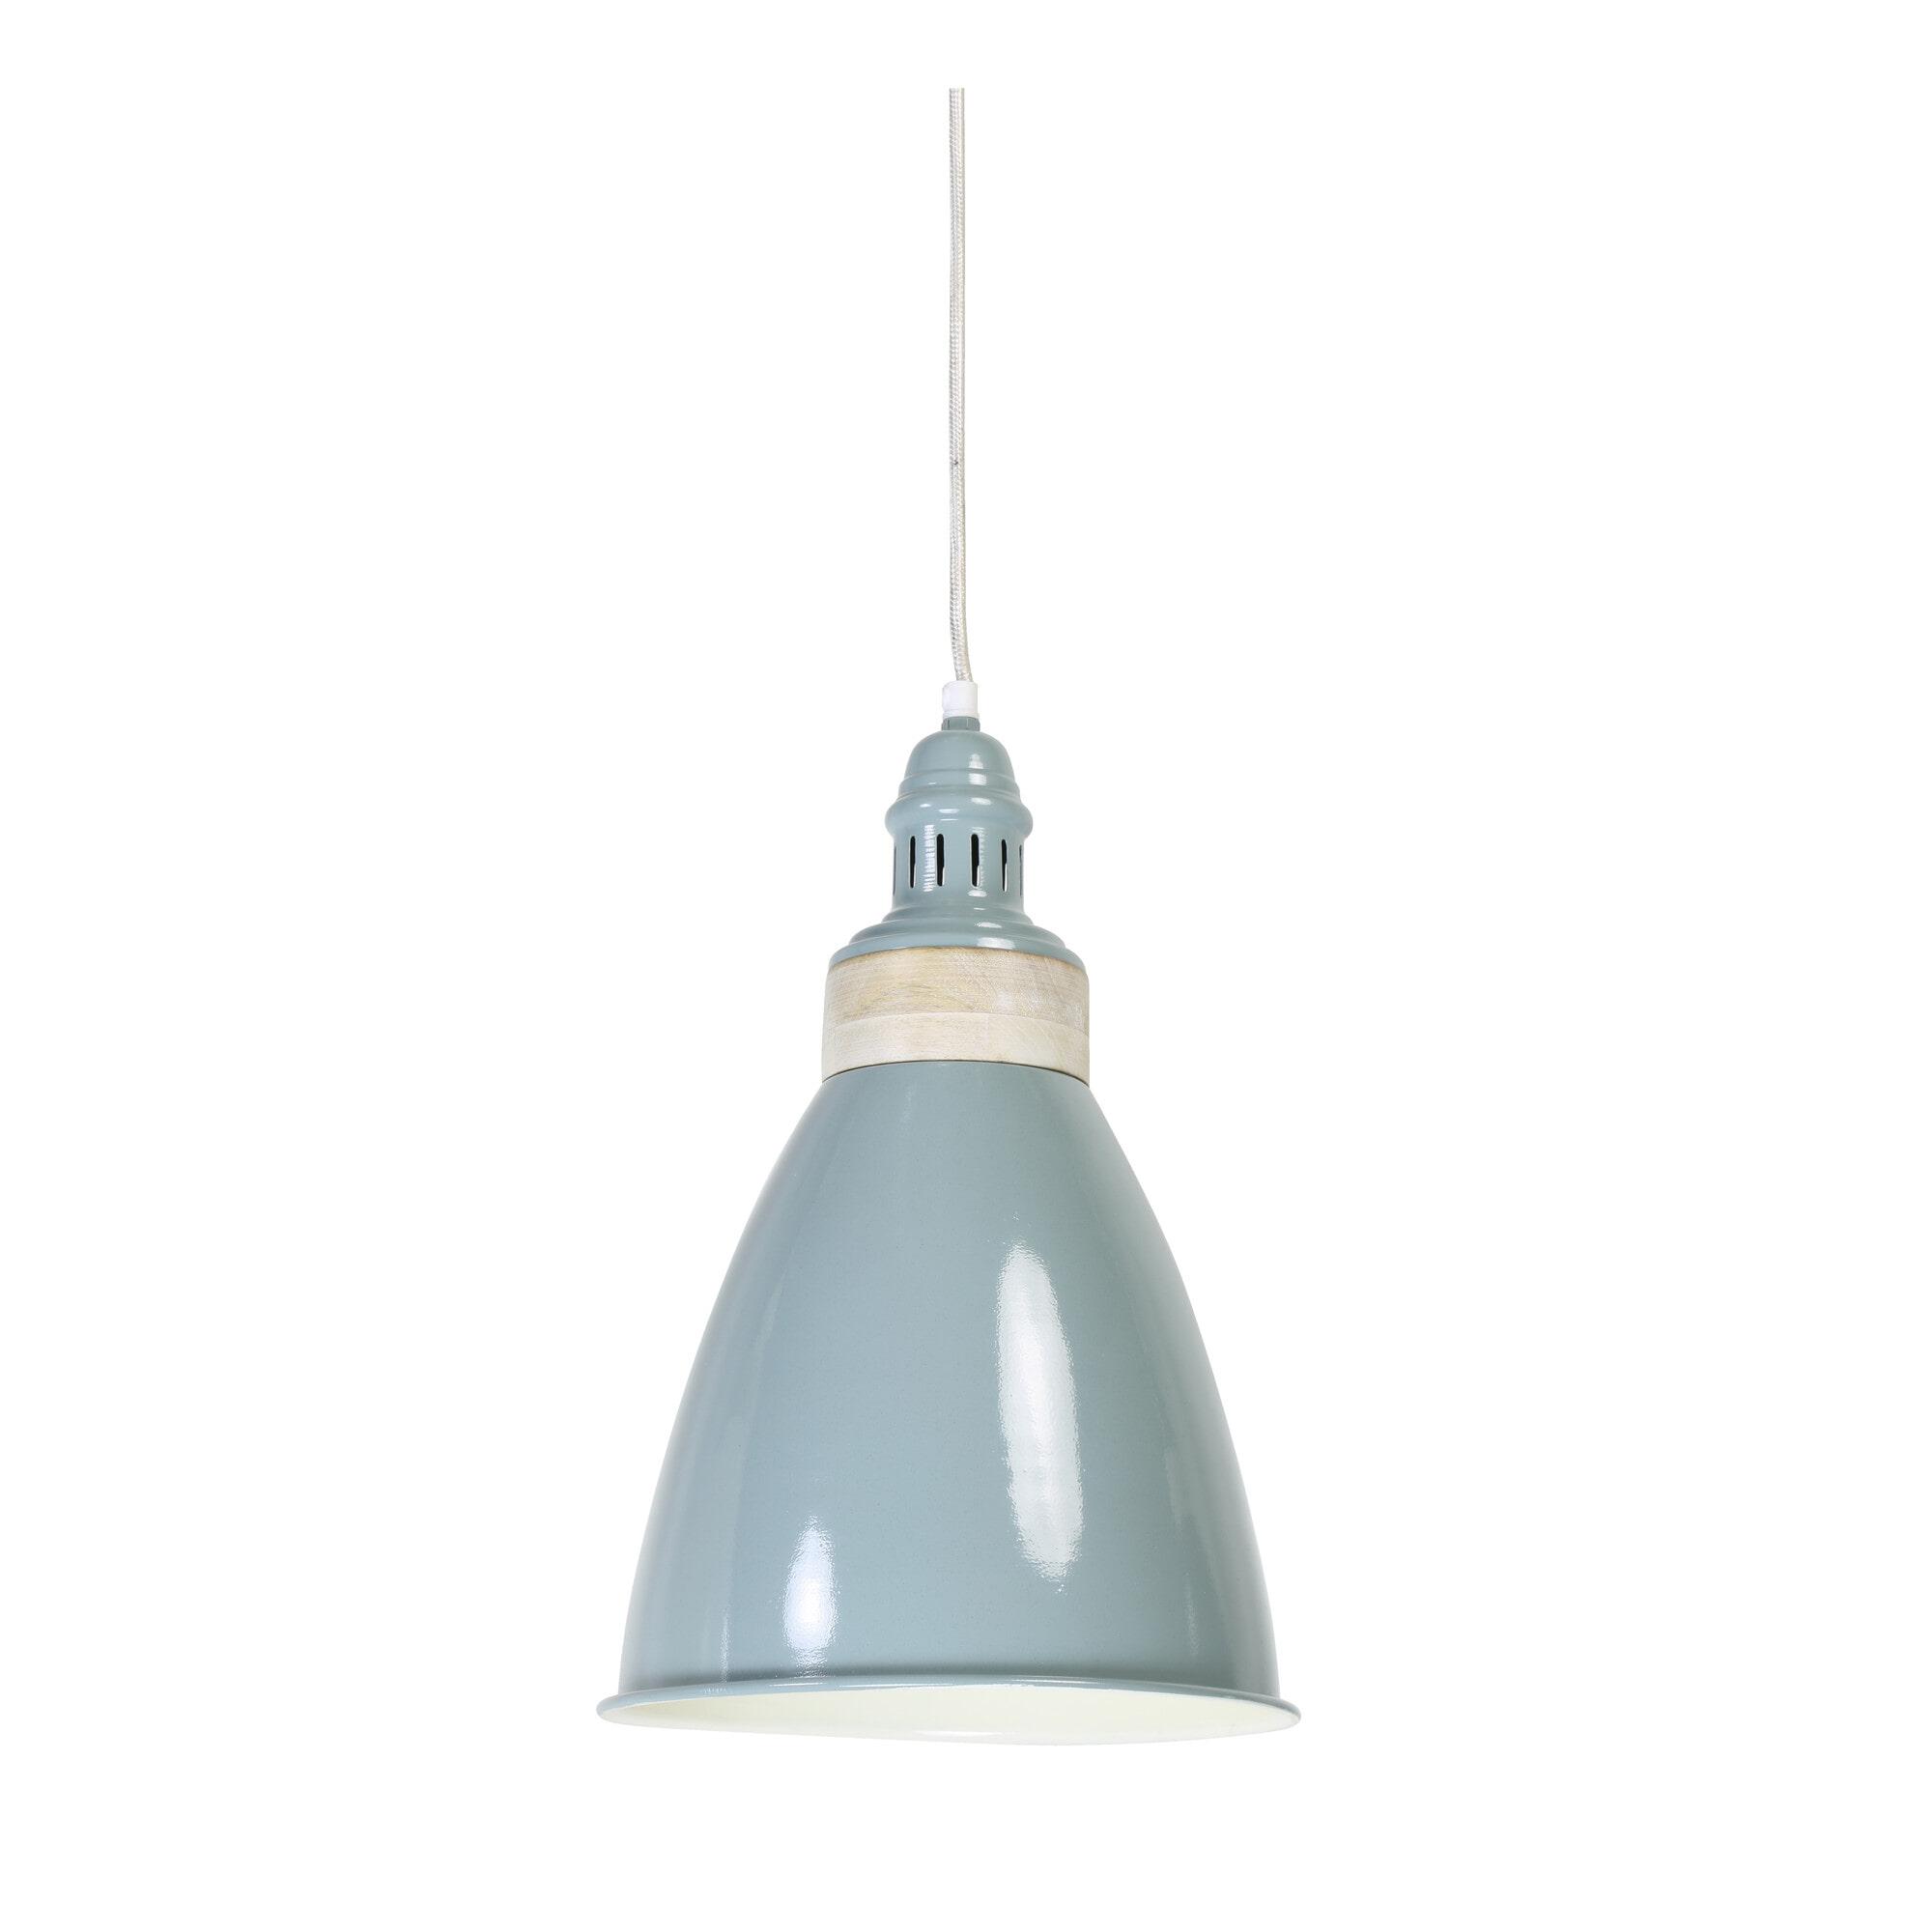 Light & Living Hanglamp 'Aimy' 25cm, kleur grijs-blauw